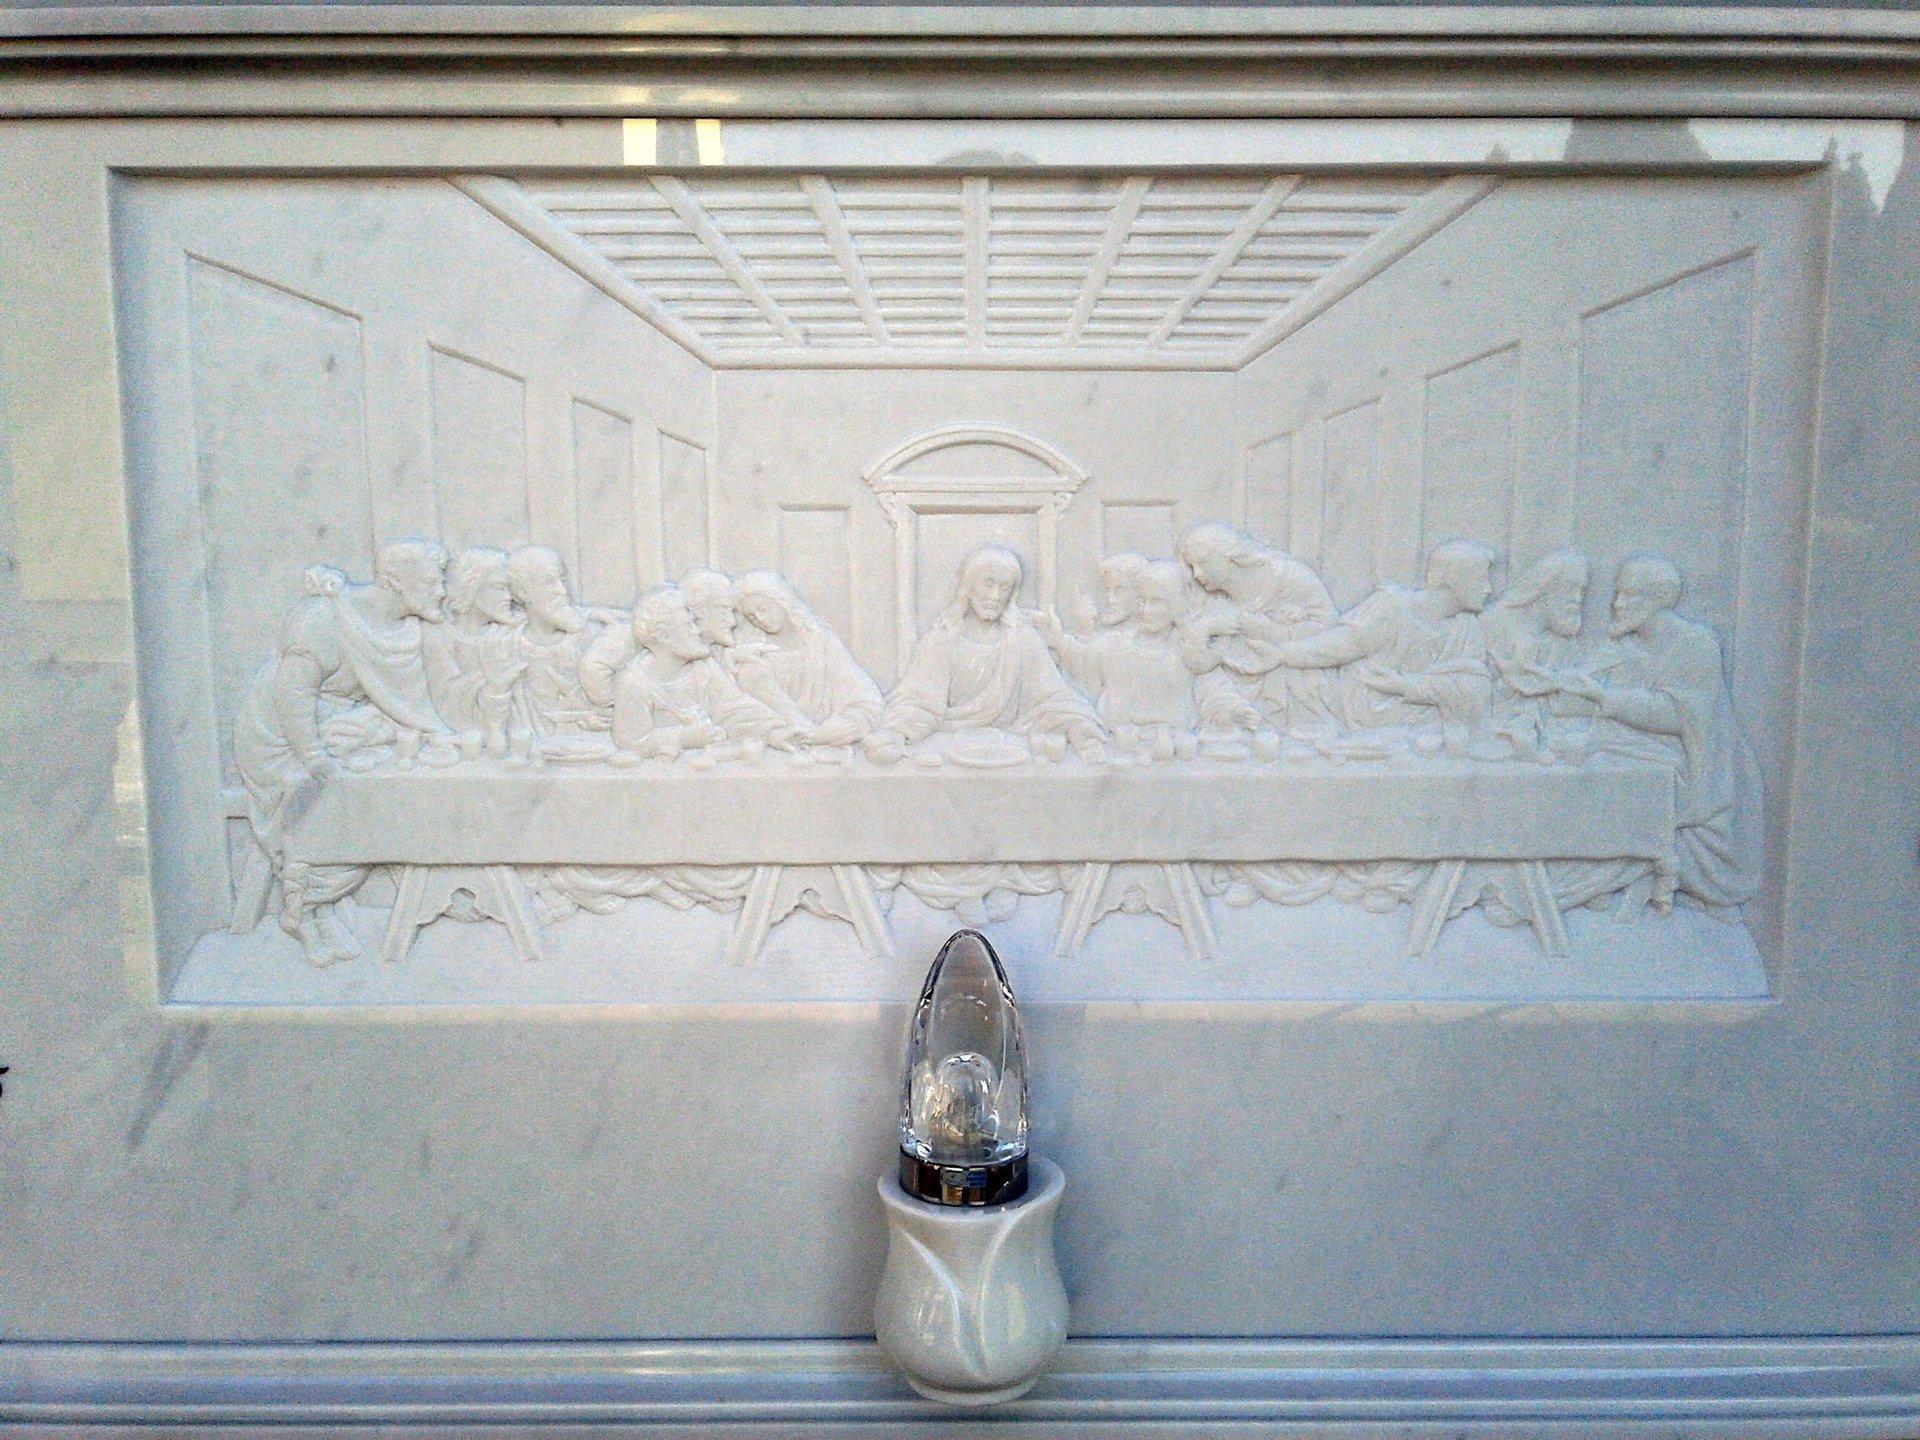 bassorilievo su marmo bianco rappresentante l'ultima cena